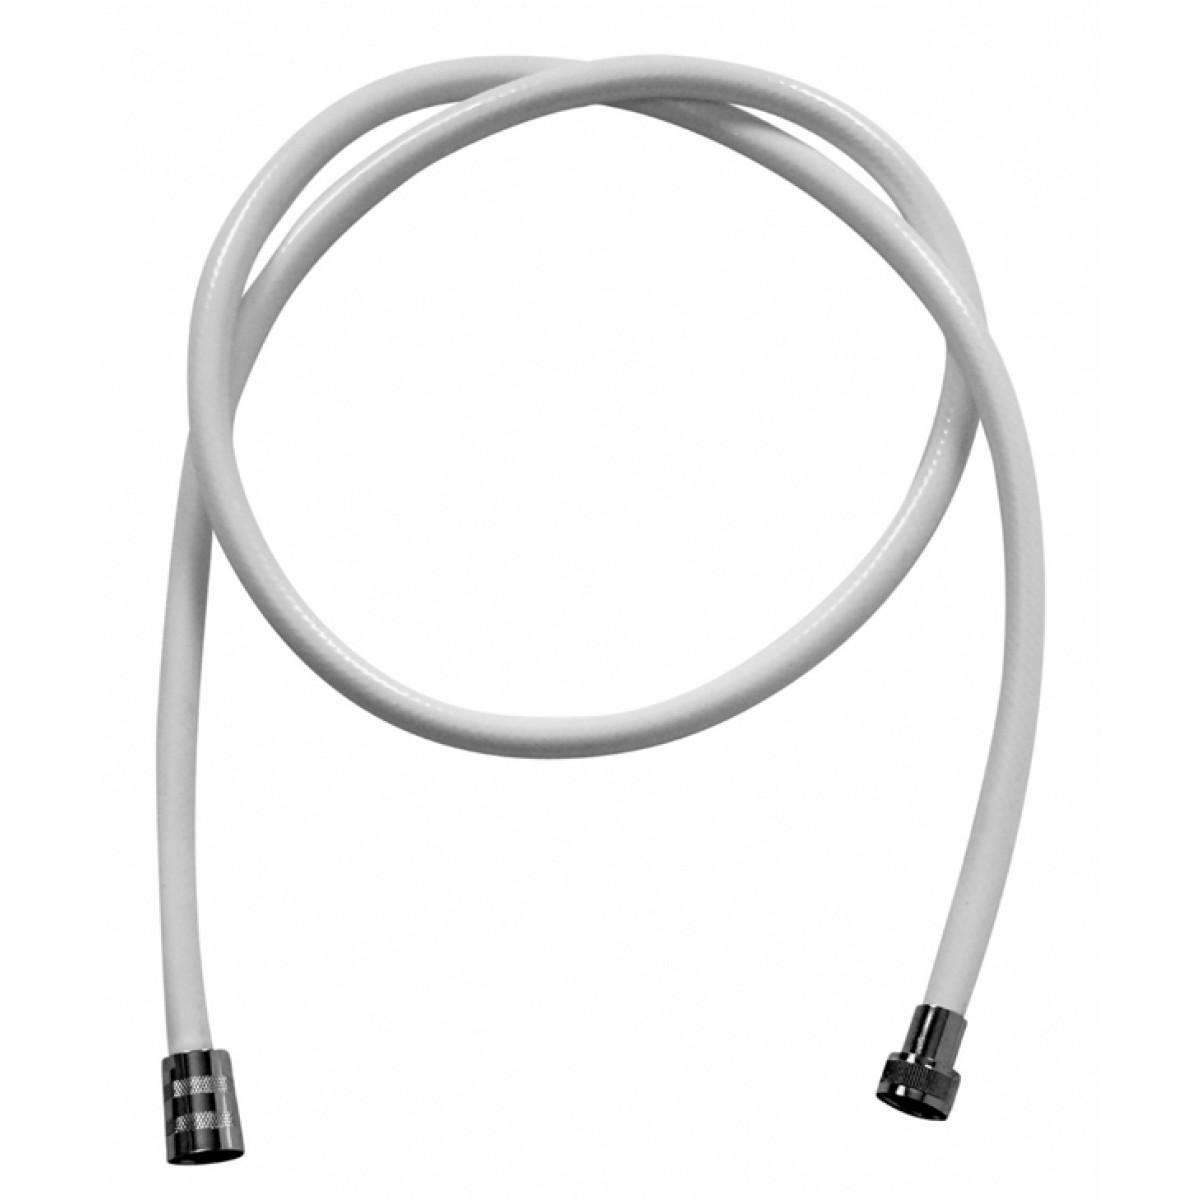 Bruseslange PVC hvid 1,5 m